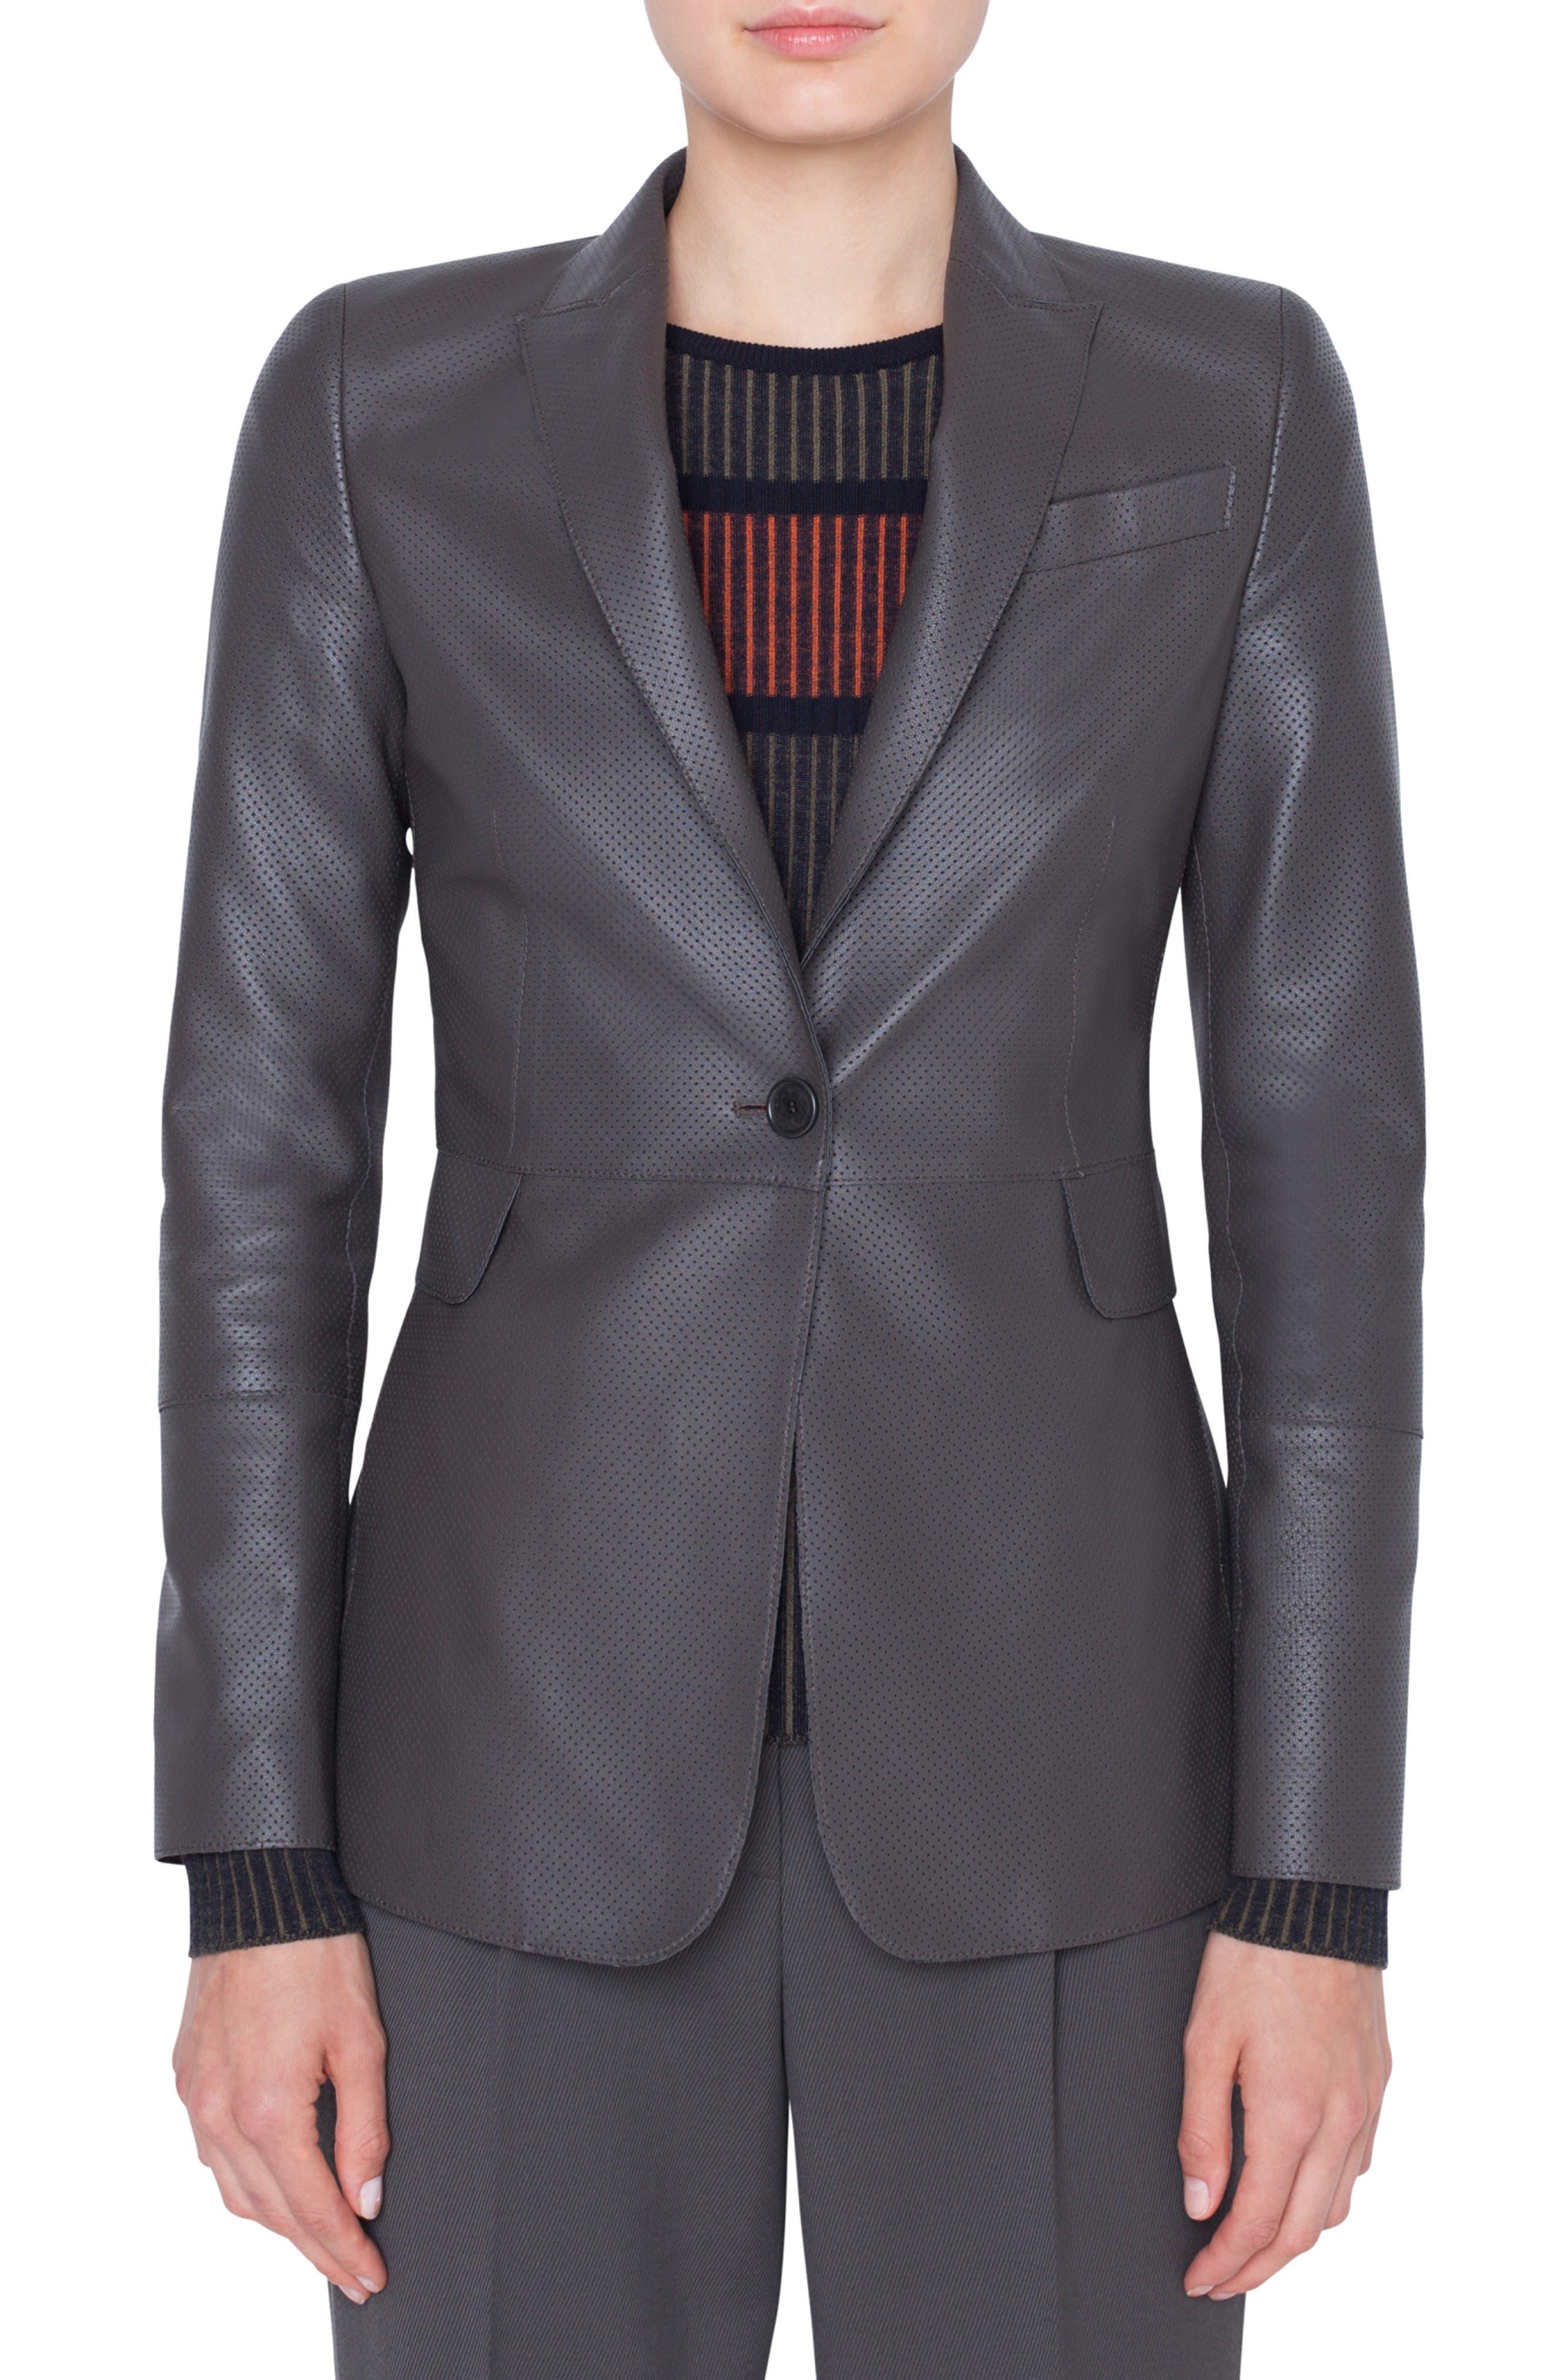 AKRIS PUNTO,                             Perforated Leather Blazer,                             Main thumbnail 1, color,                             OLIVA